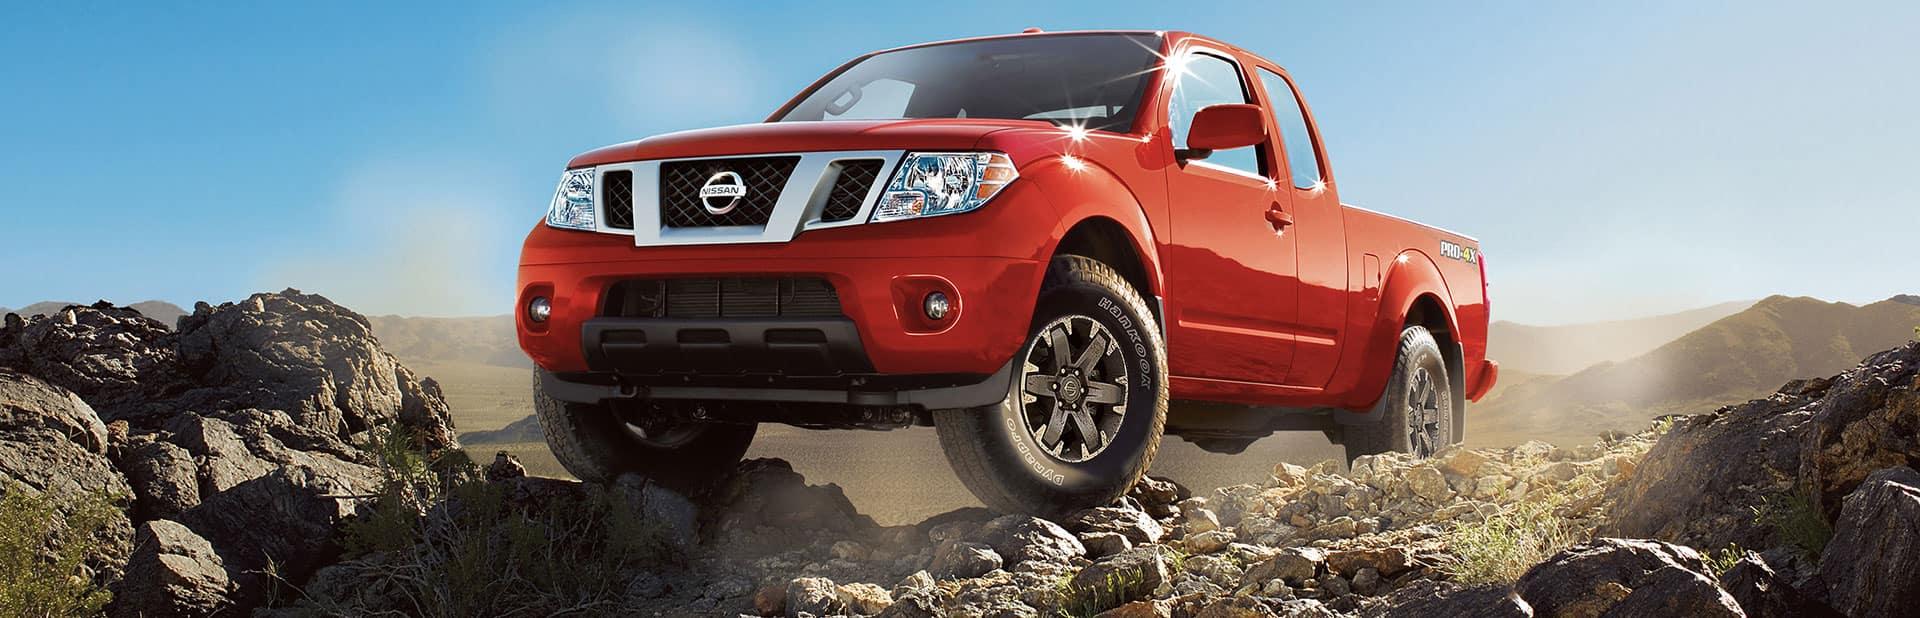 Nissan Tire Wheel Service